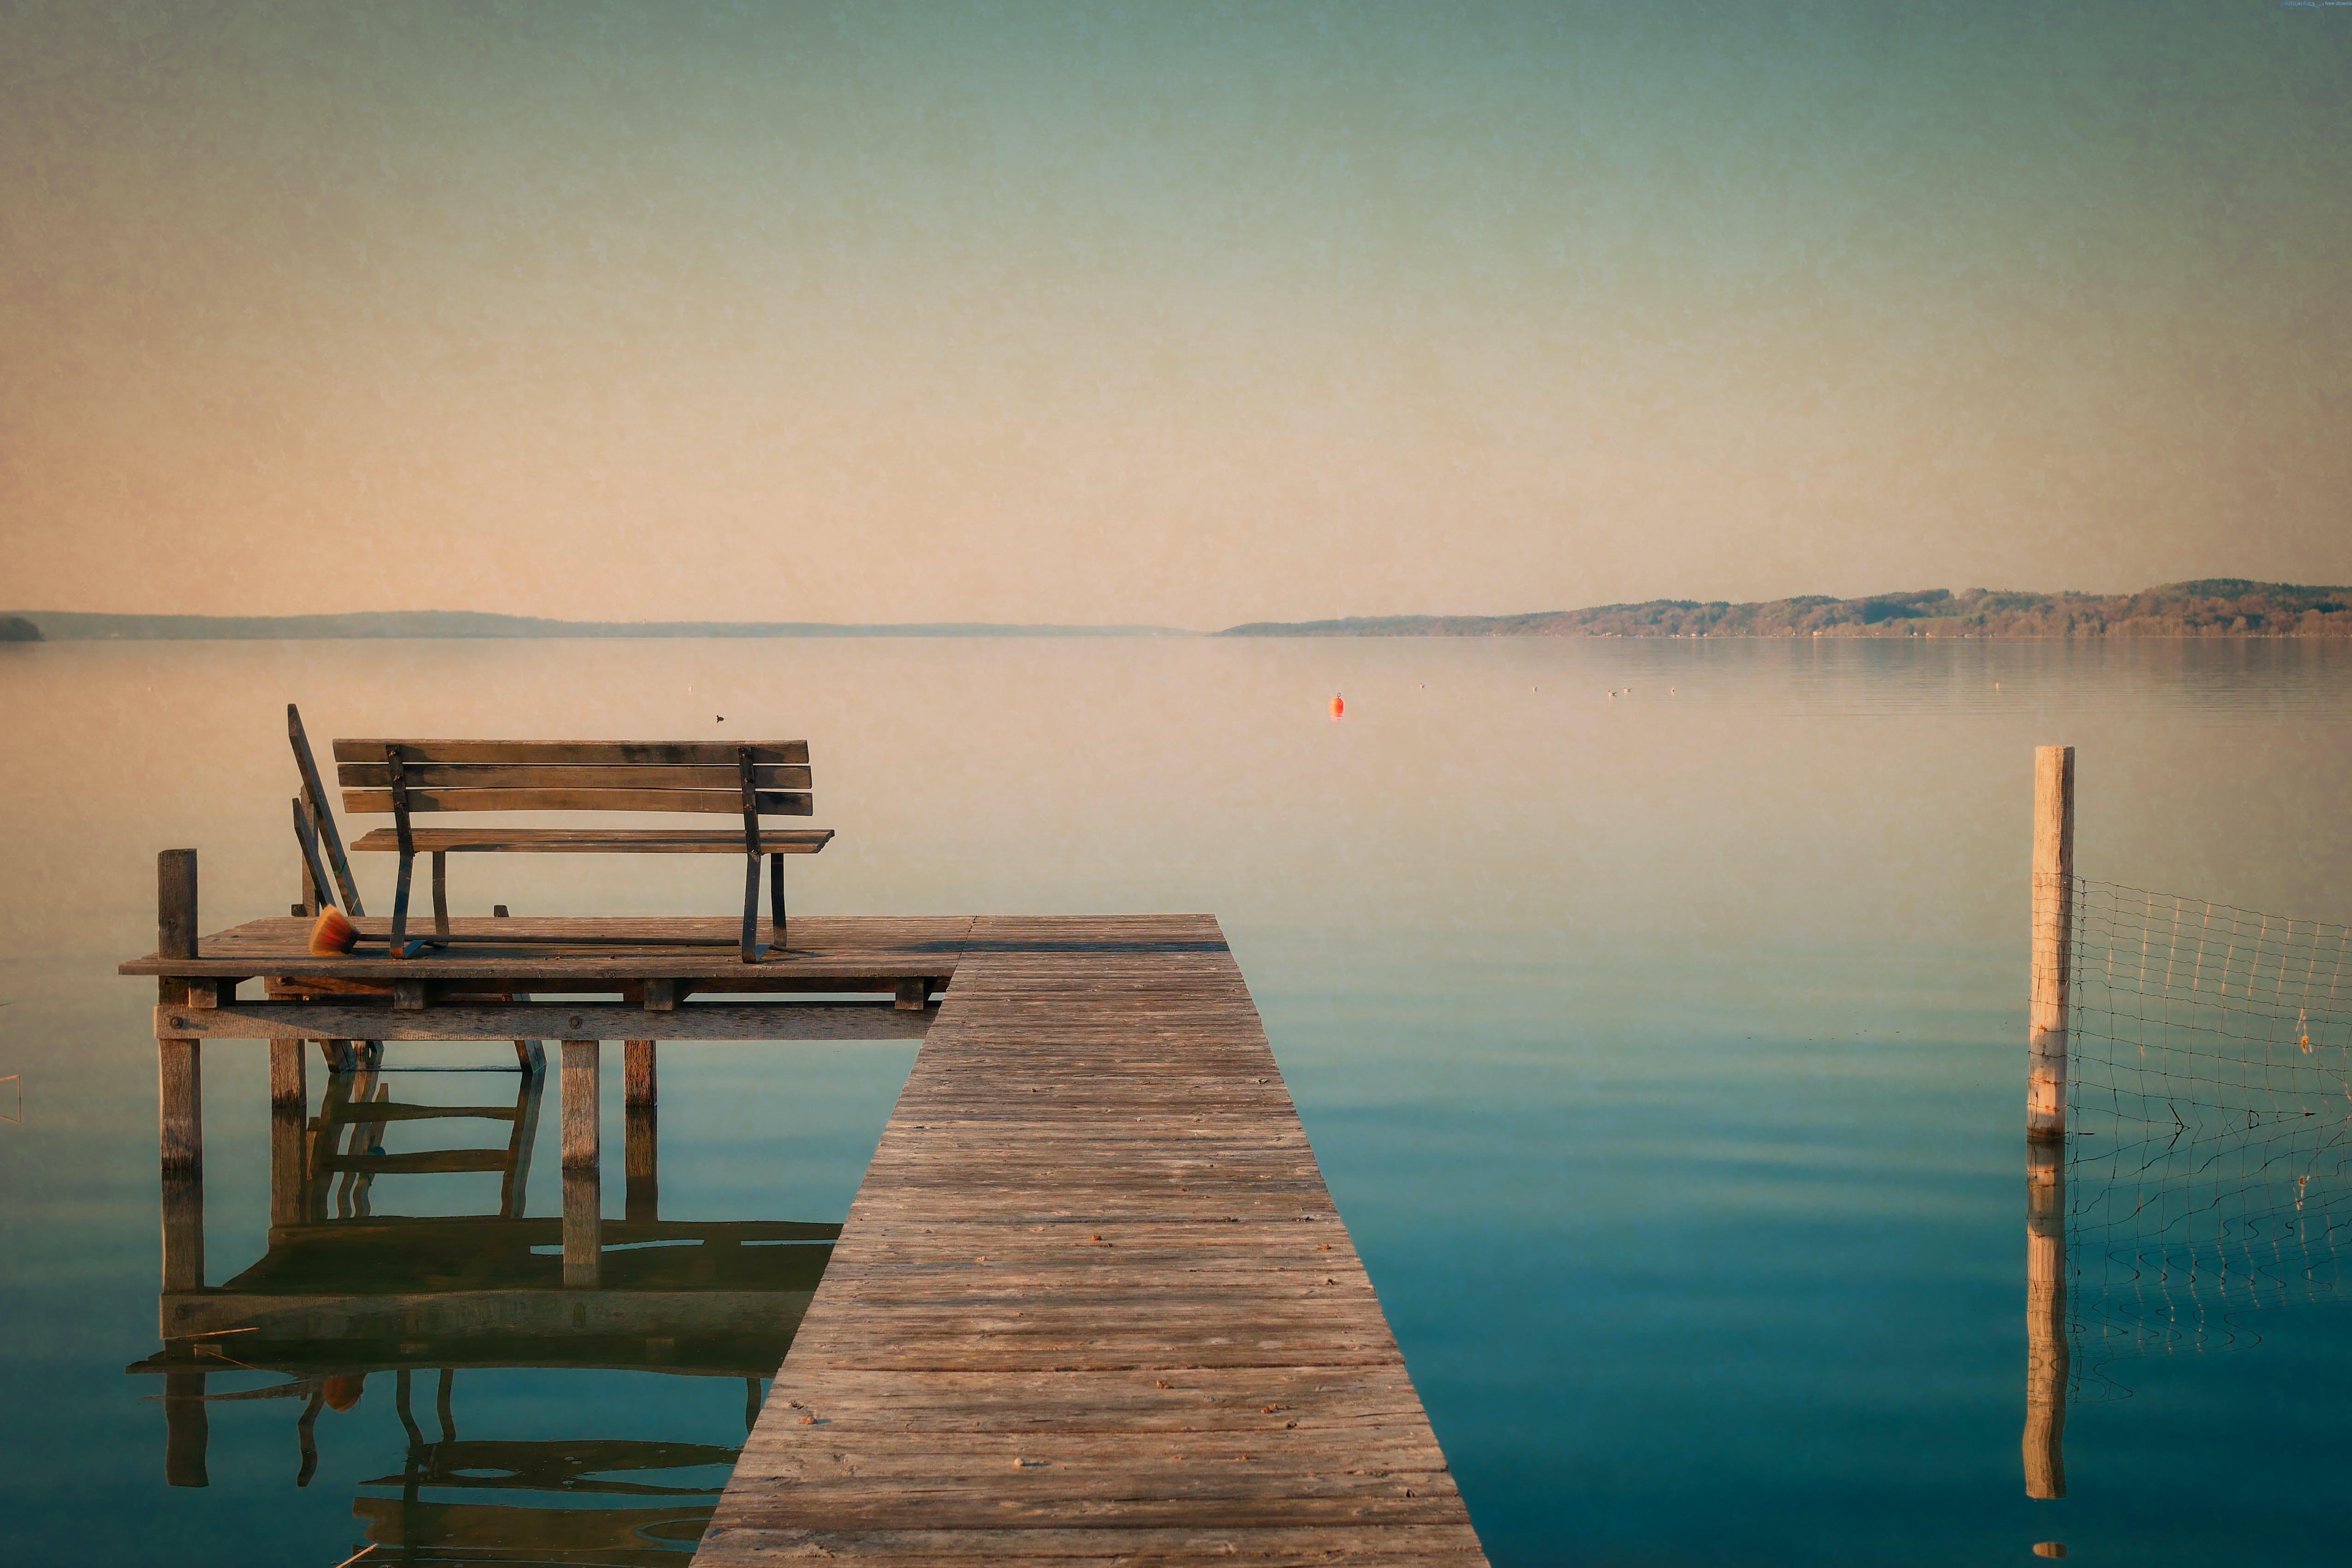 Dock and Sea